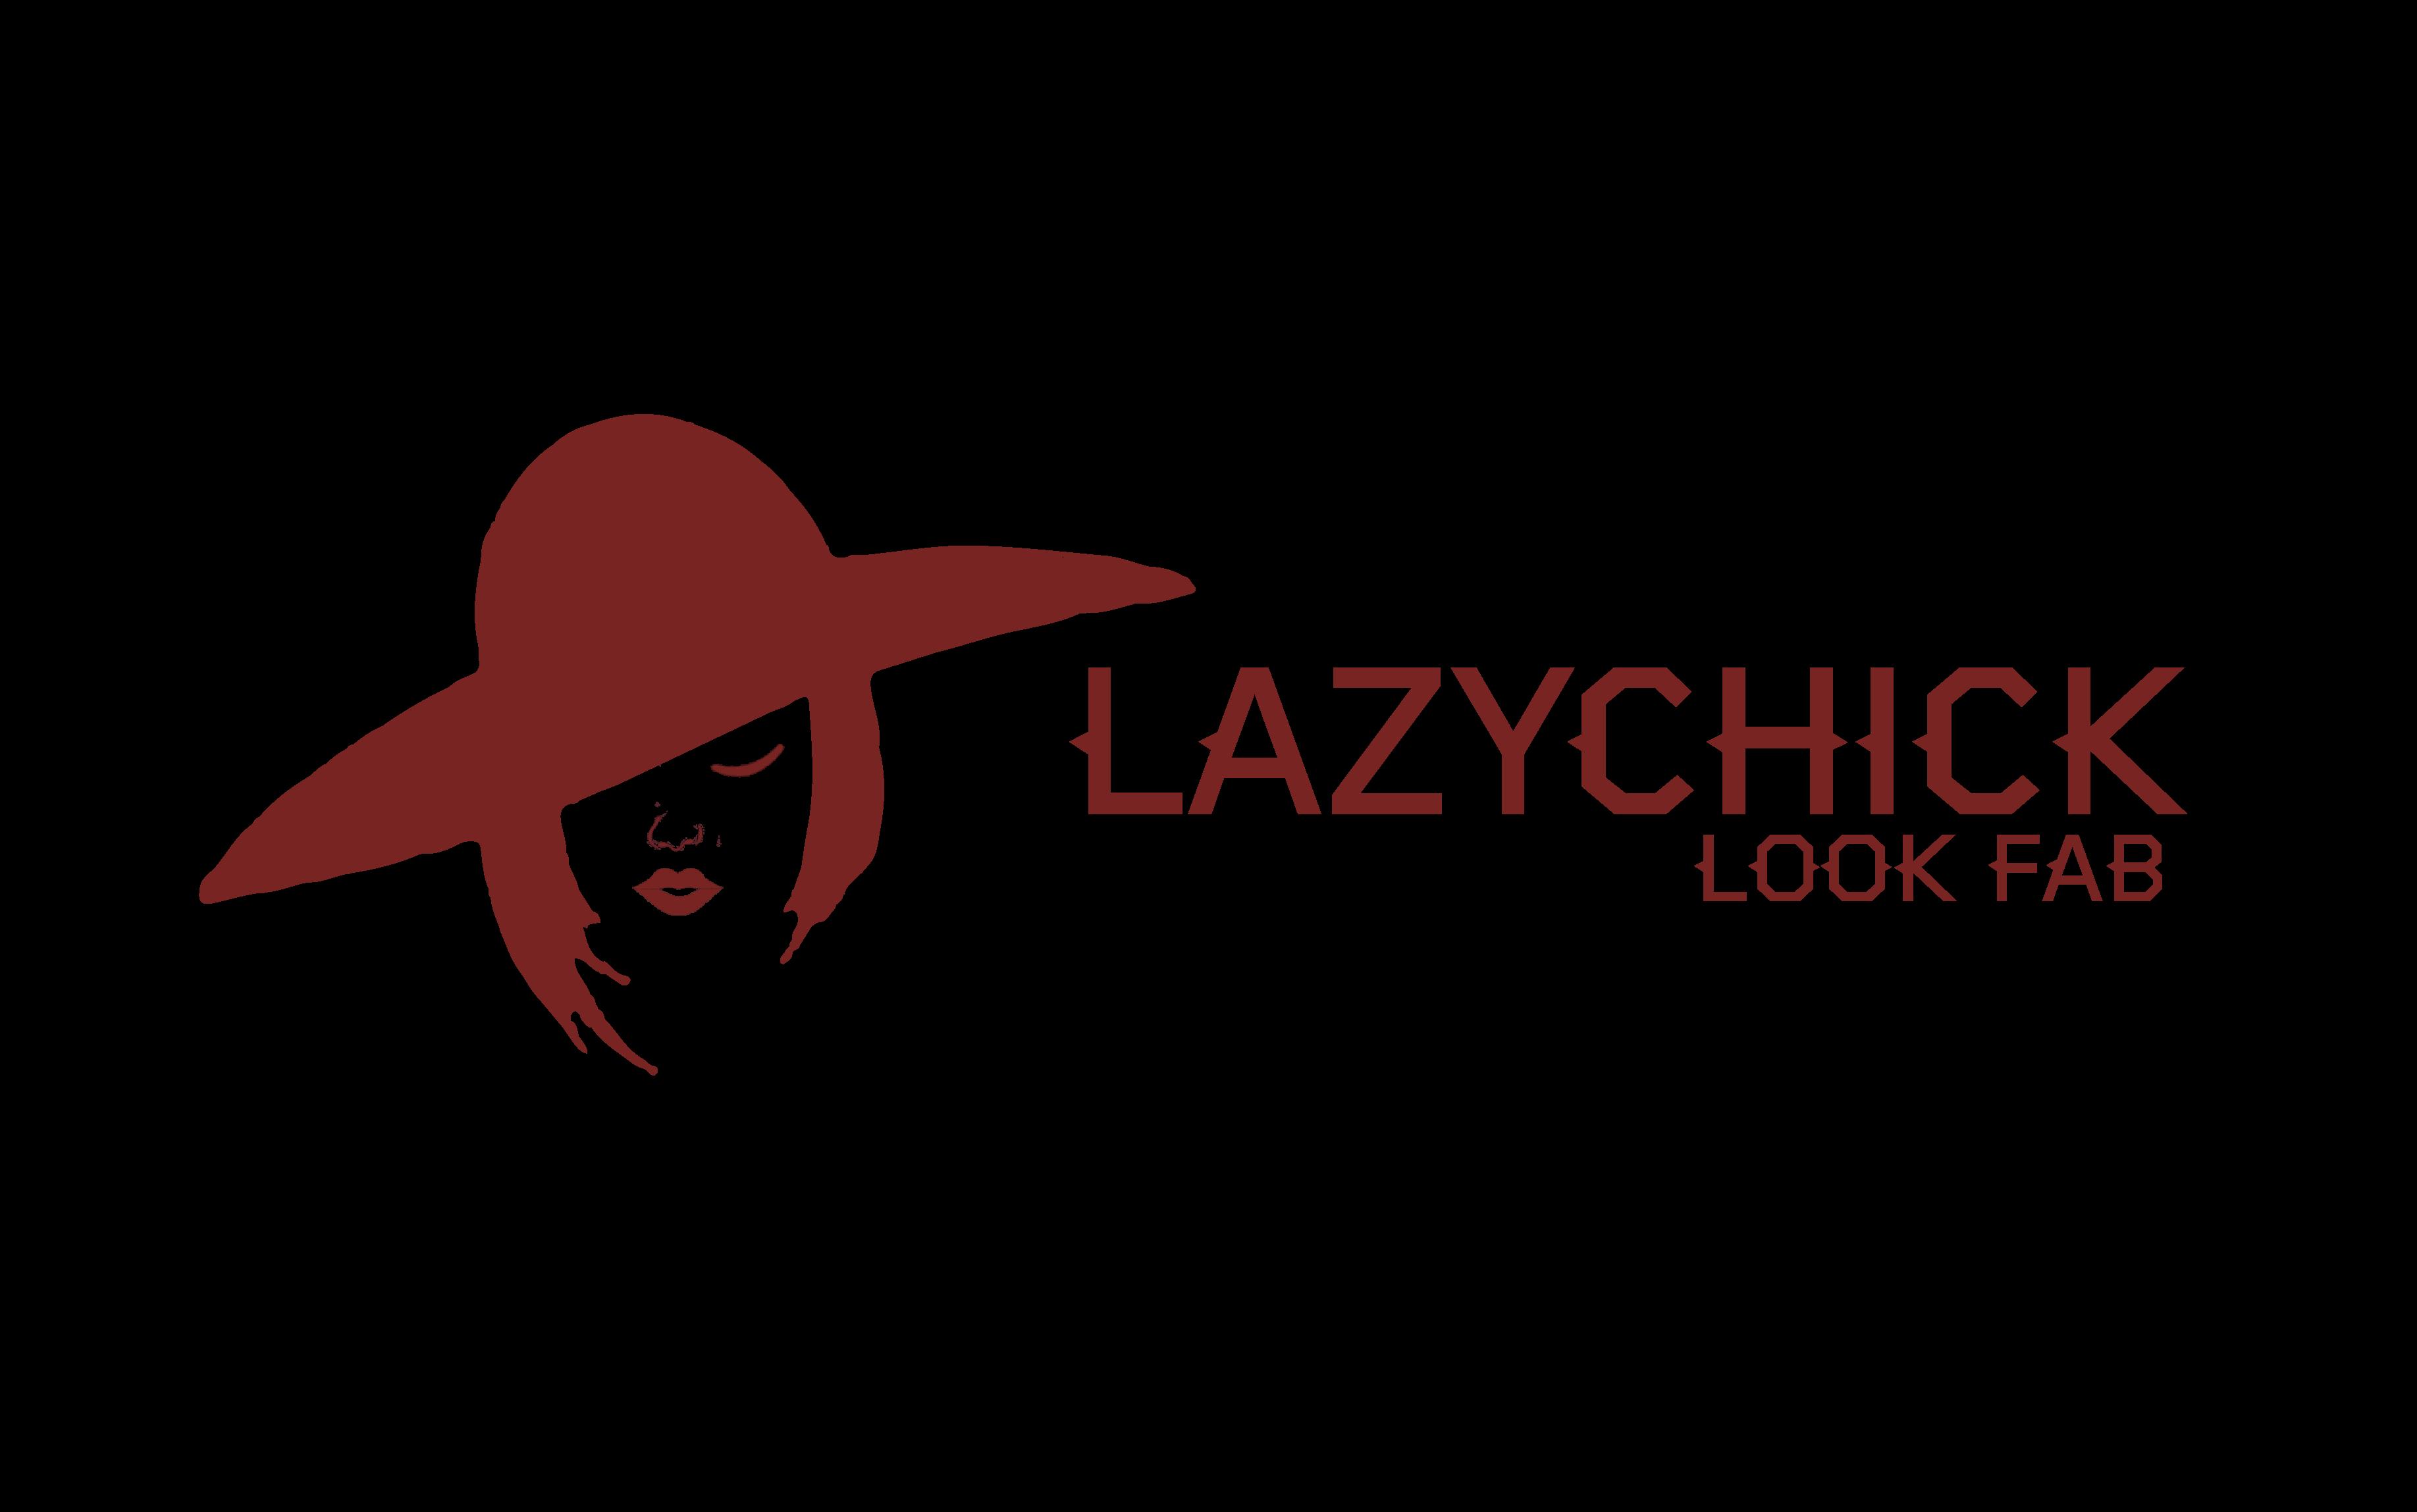 Lazychick Official Logo